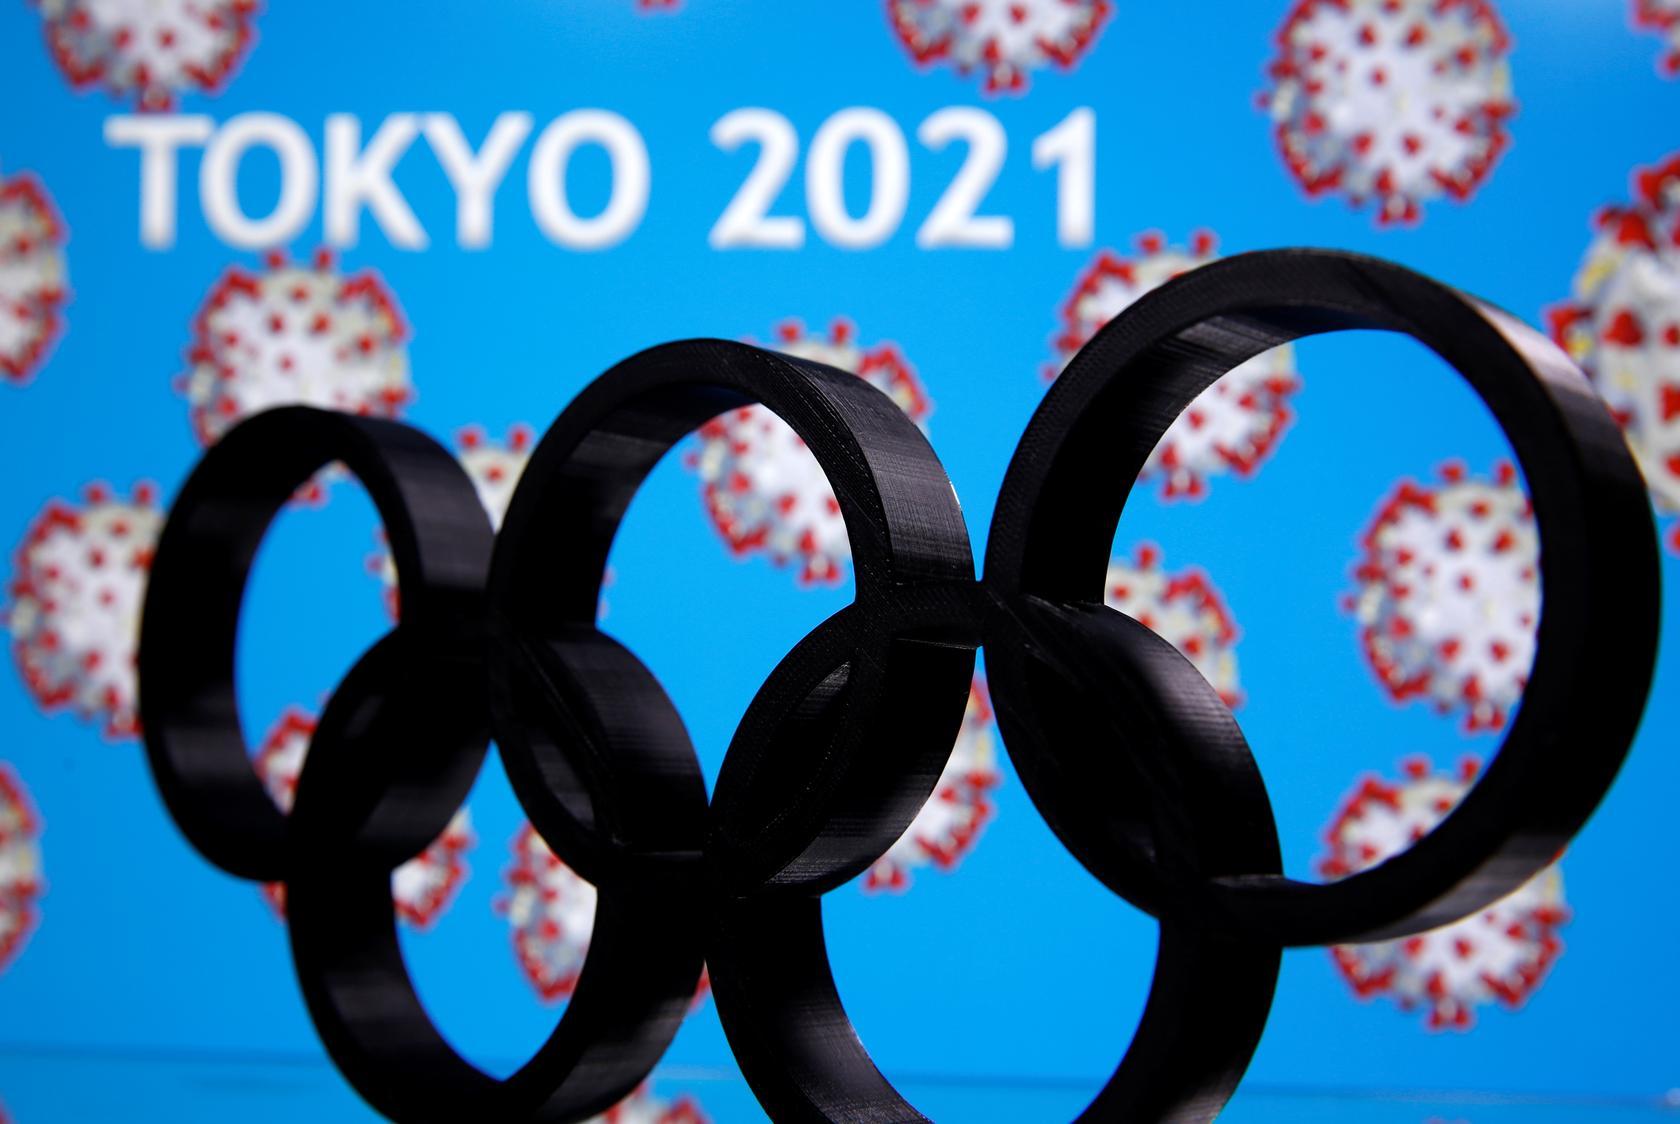 2020 Olympics postponed till 2021 - Sports - Olympics ...